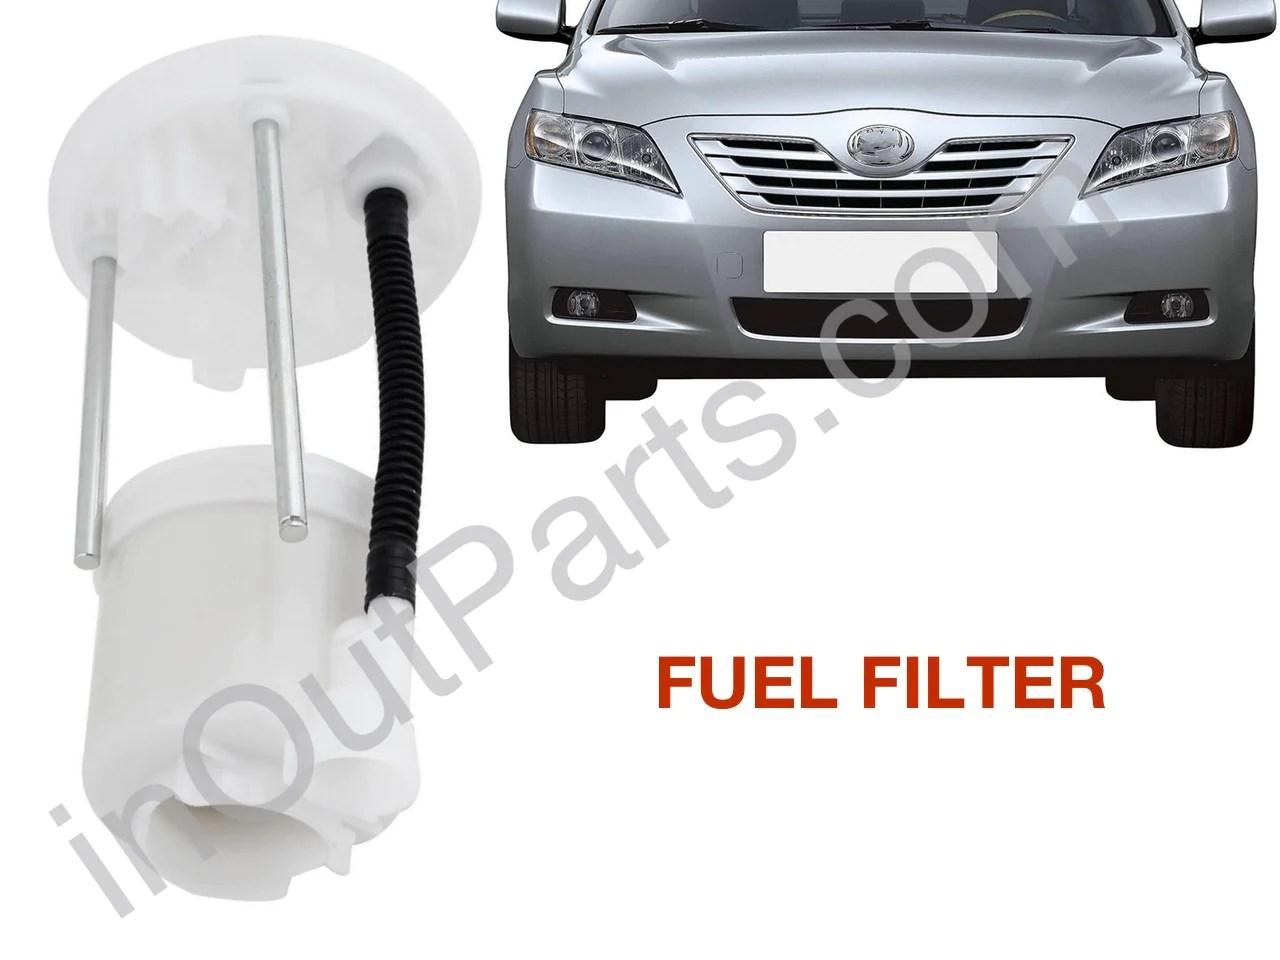 medium resolution of fuel filter toyota camry 2azfe 2006 2007 2008 2009 2010 2011 2012 1990 toyota pickup fuel